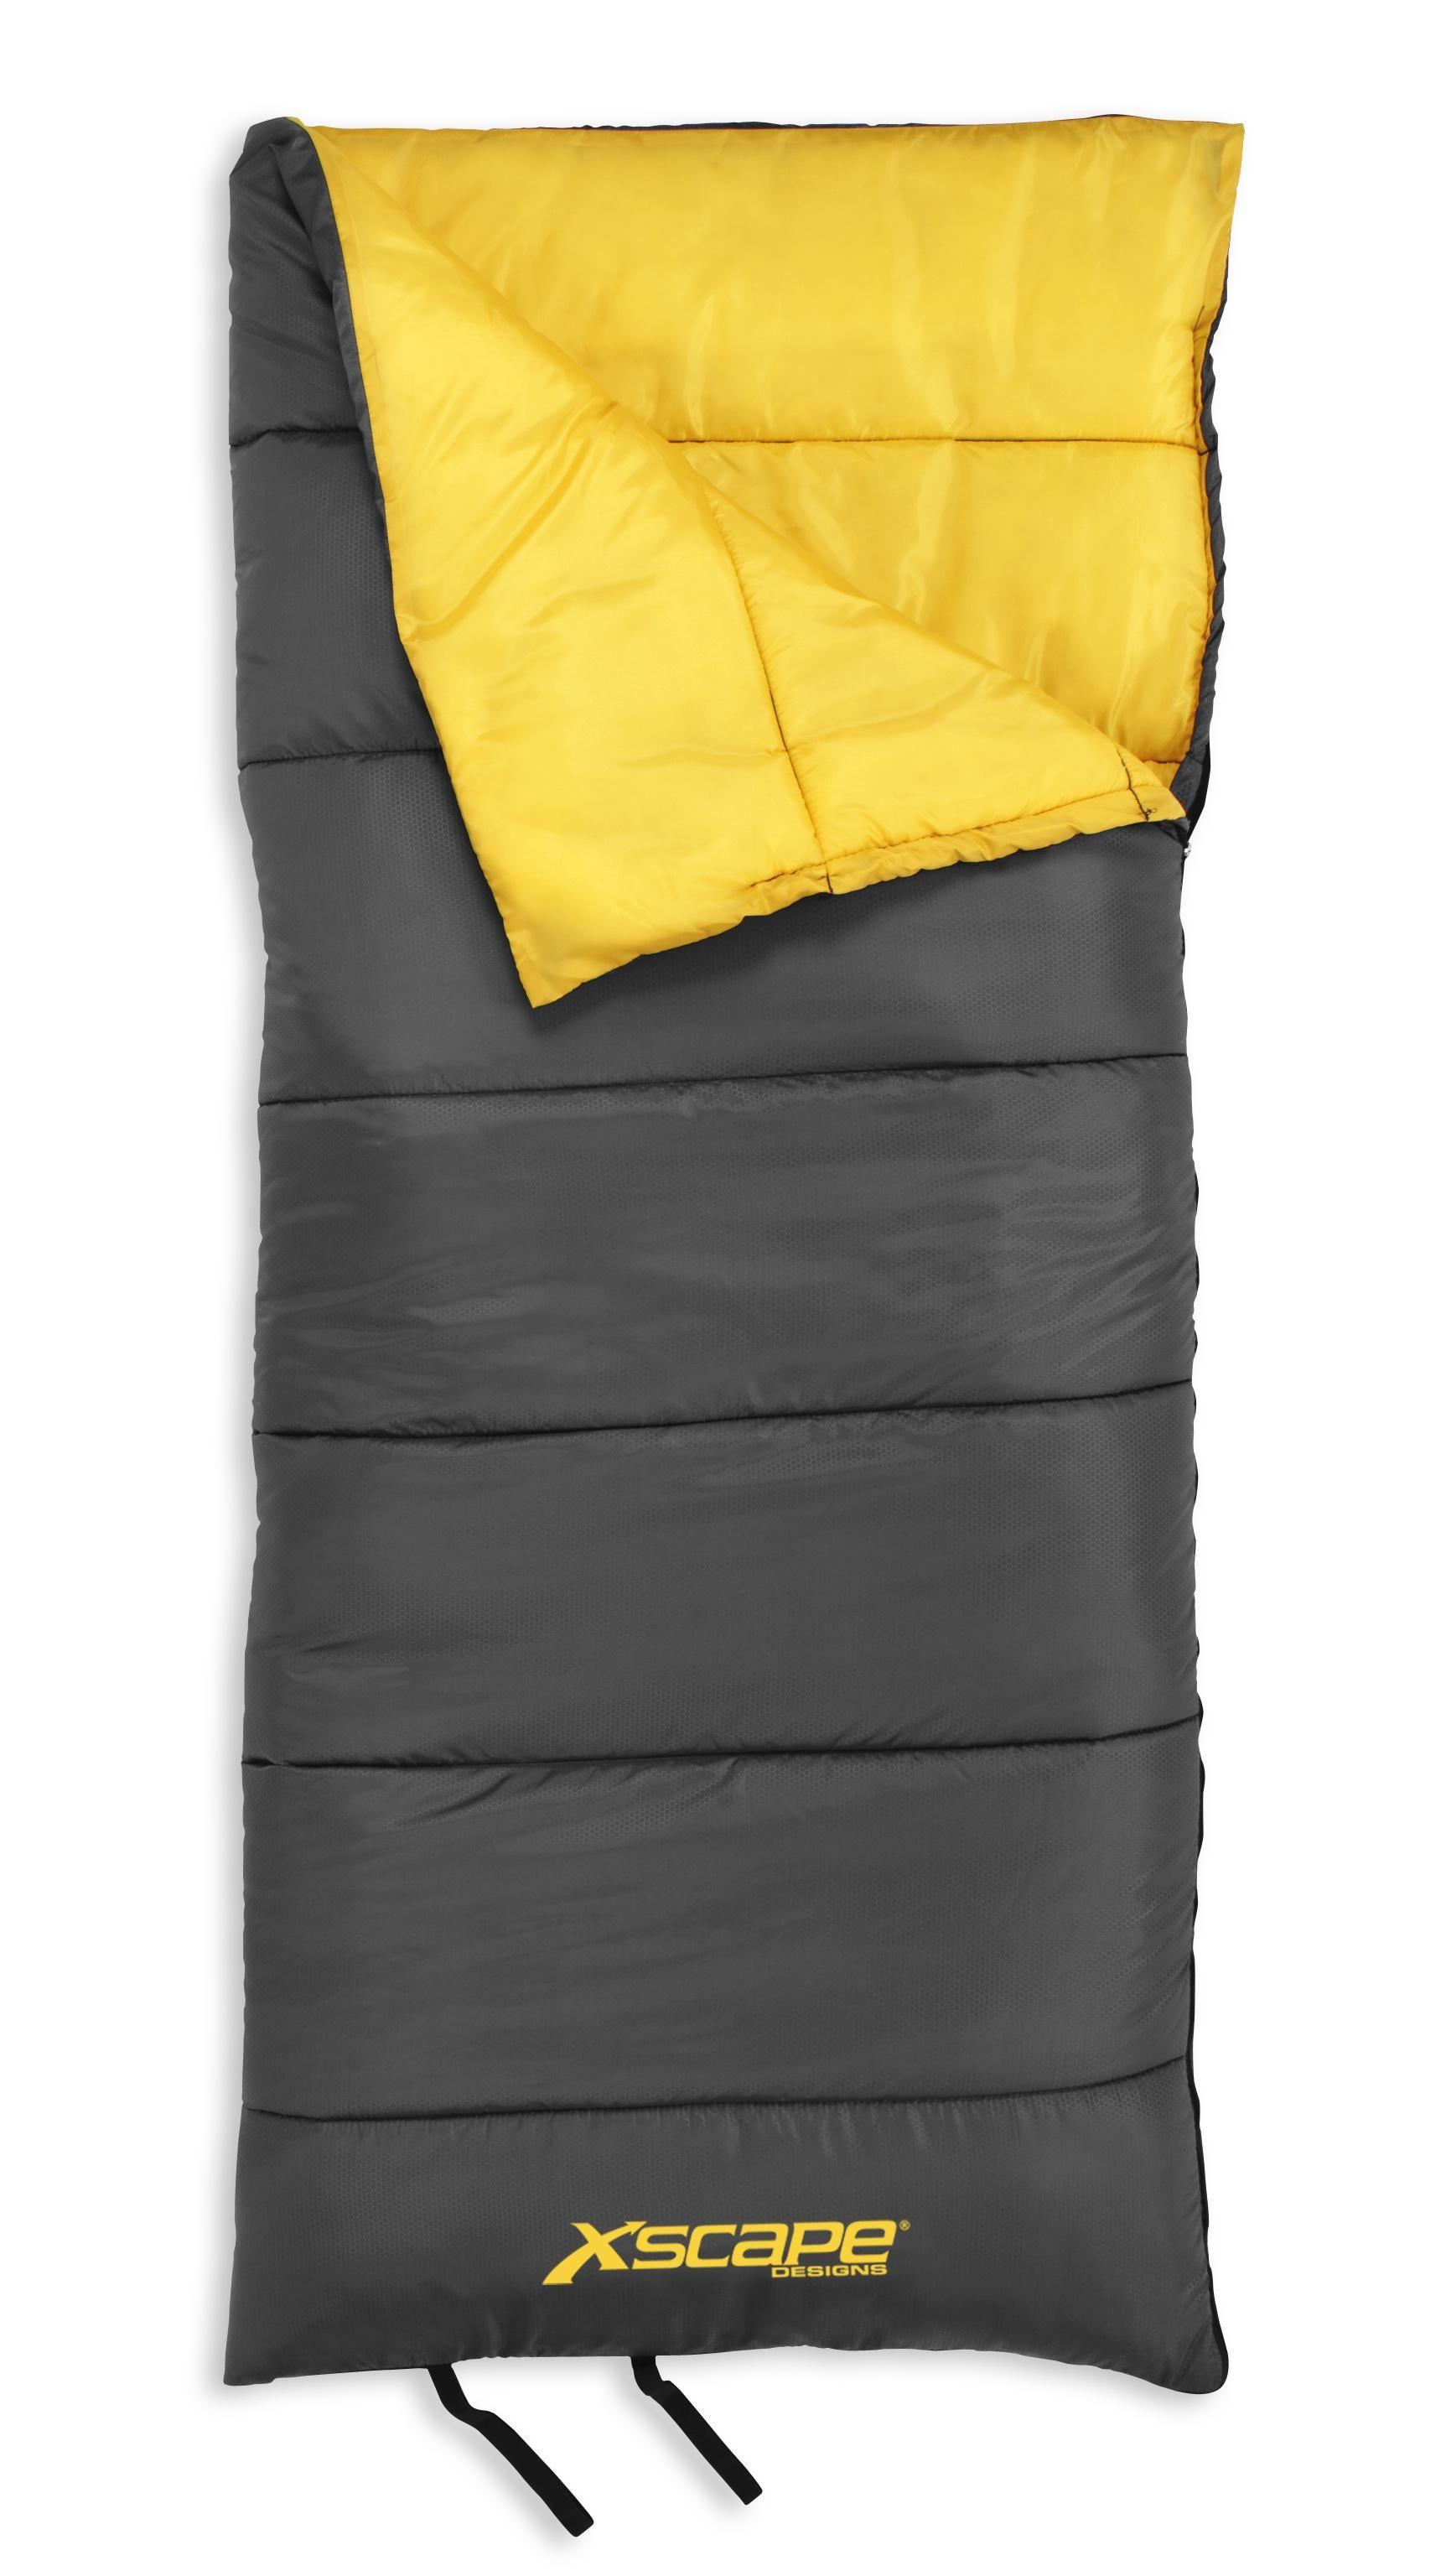 Xscape Solo 3 Lb Rectangular Sleeping Bag